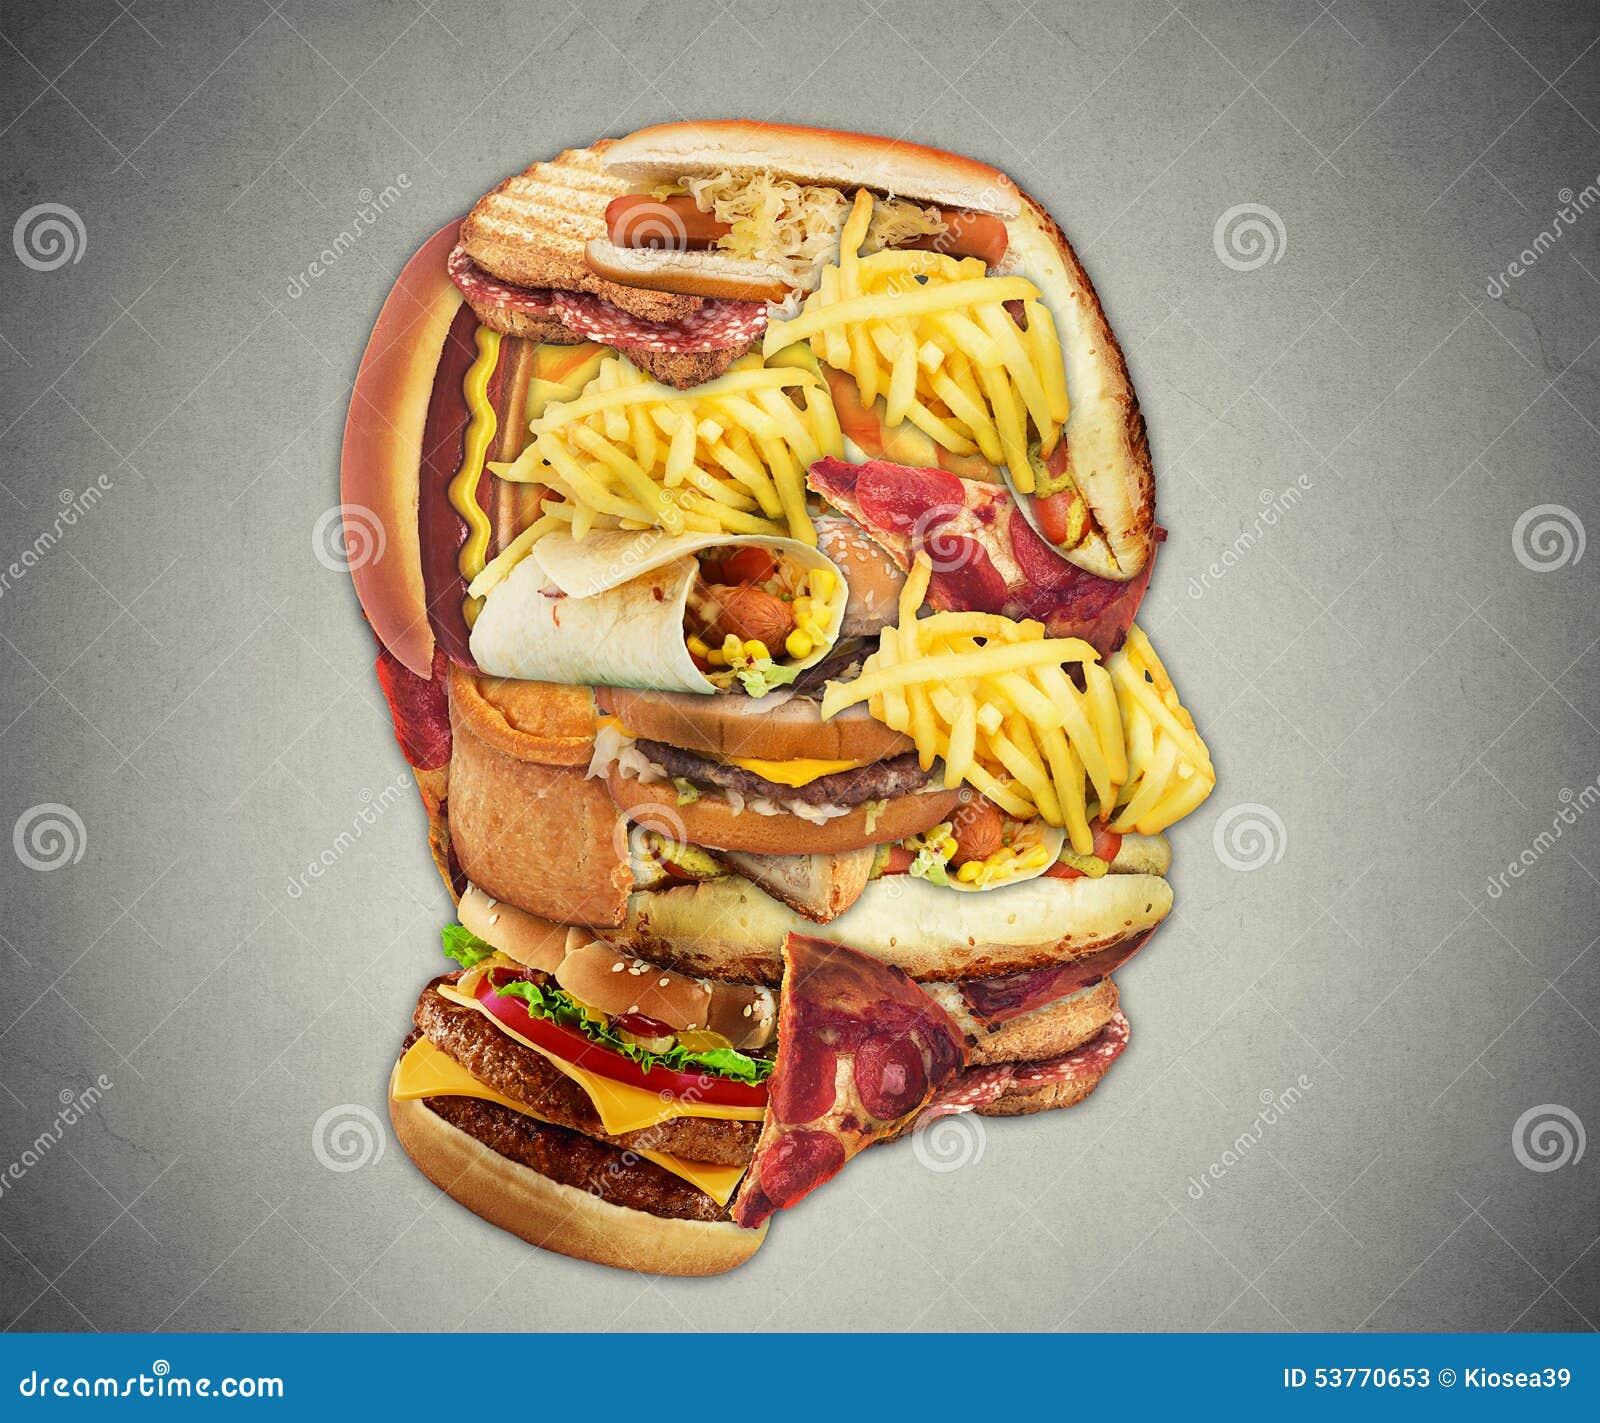 Heart Healthy Diet Fast Food